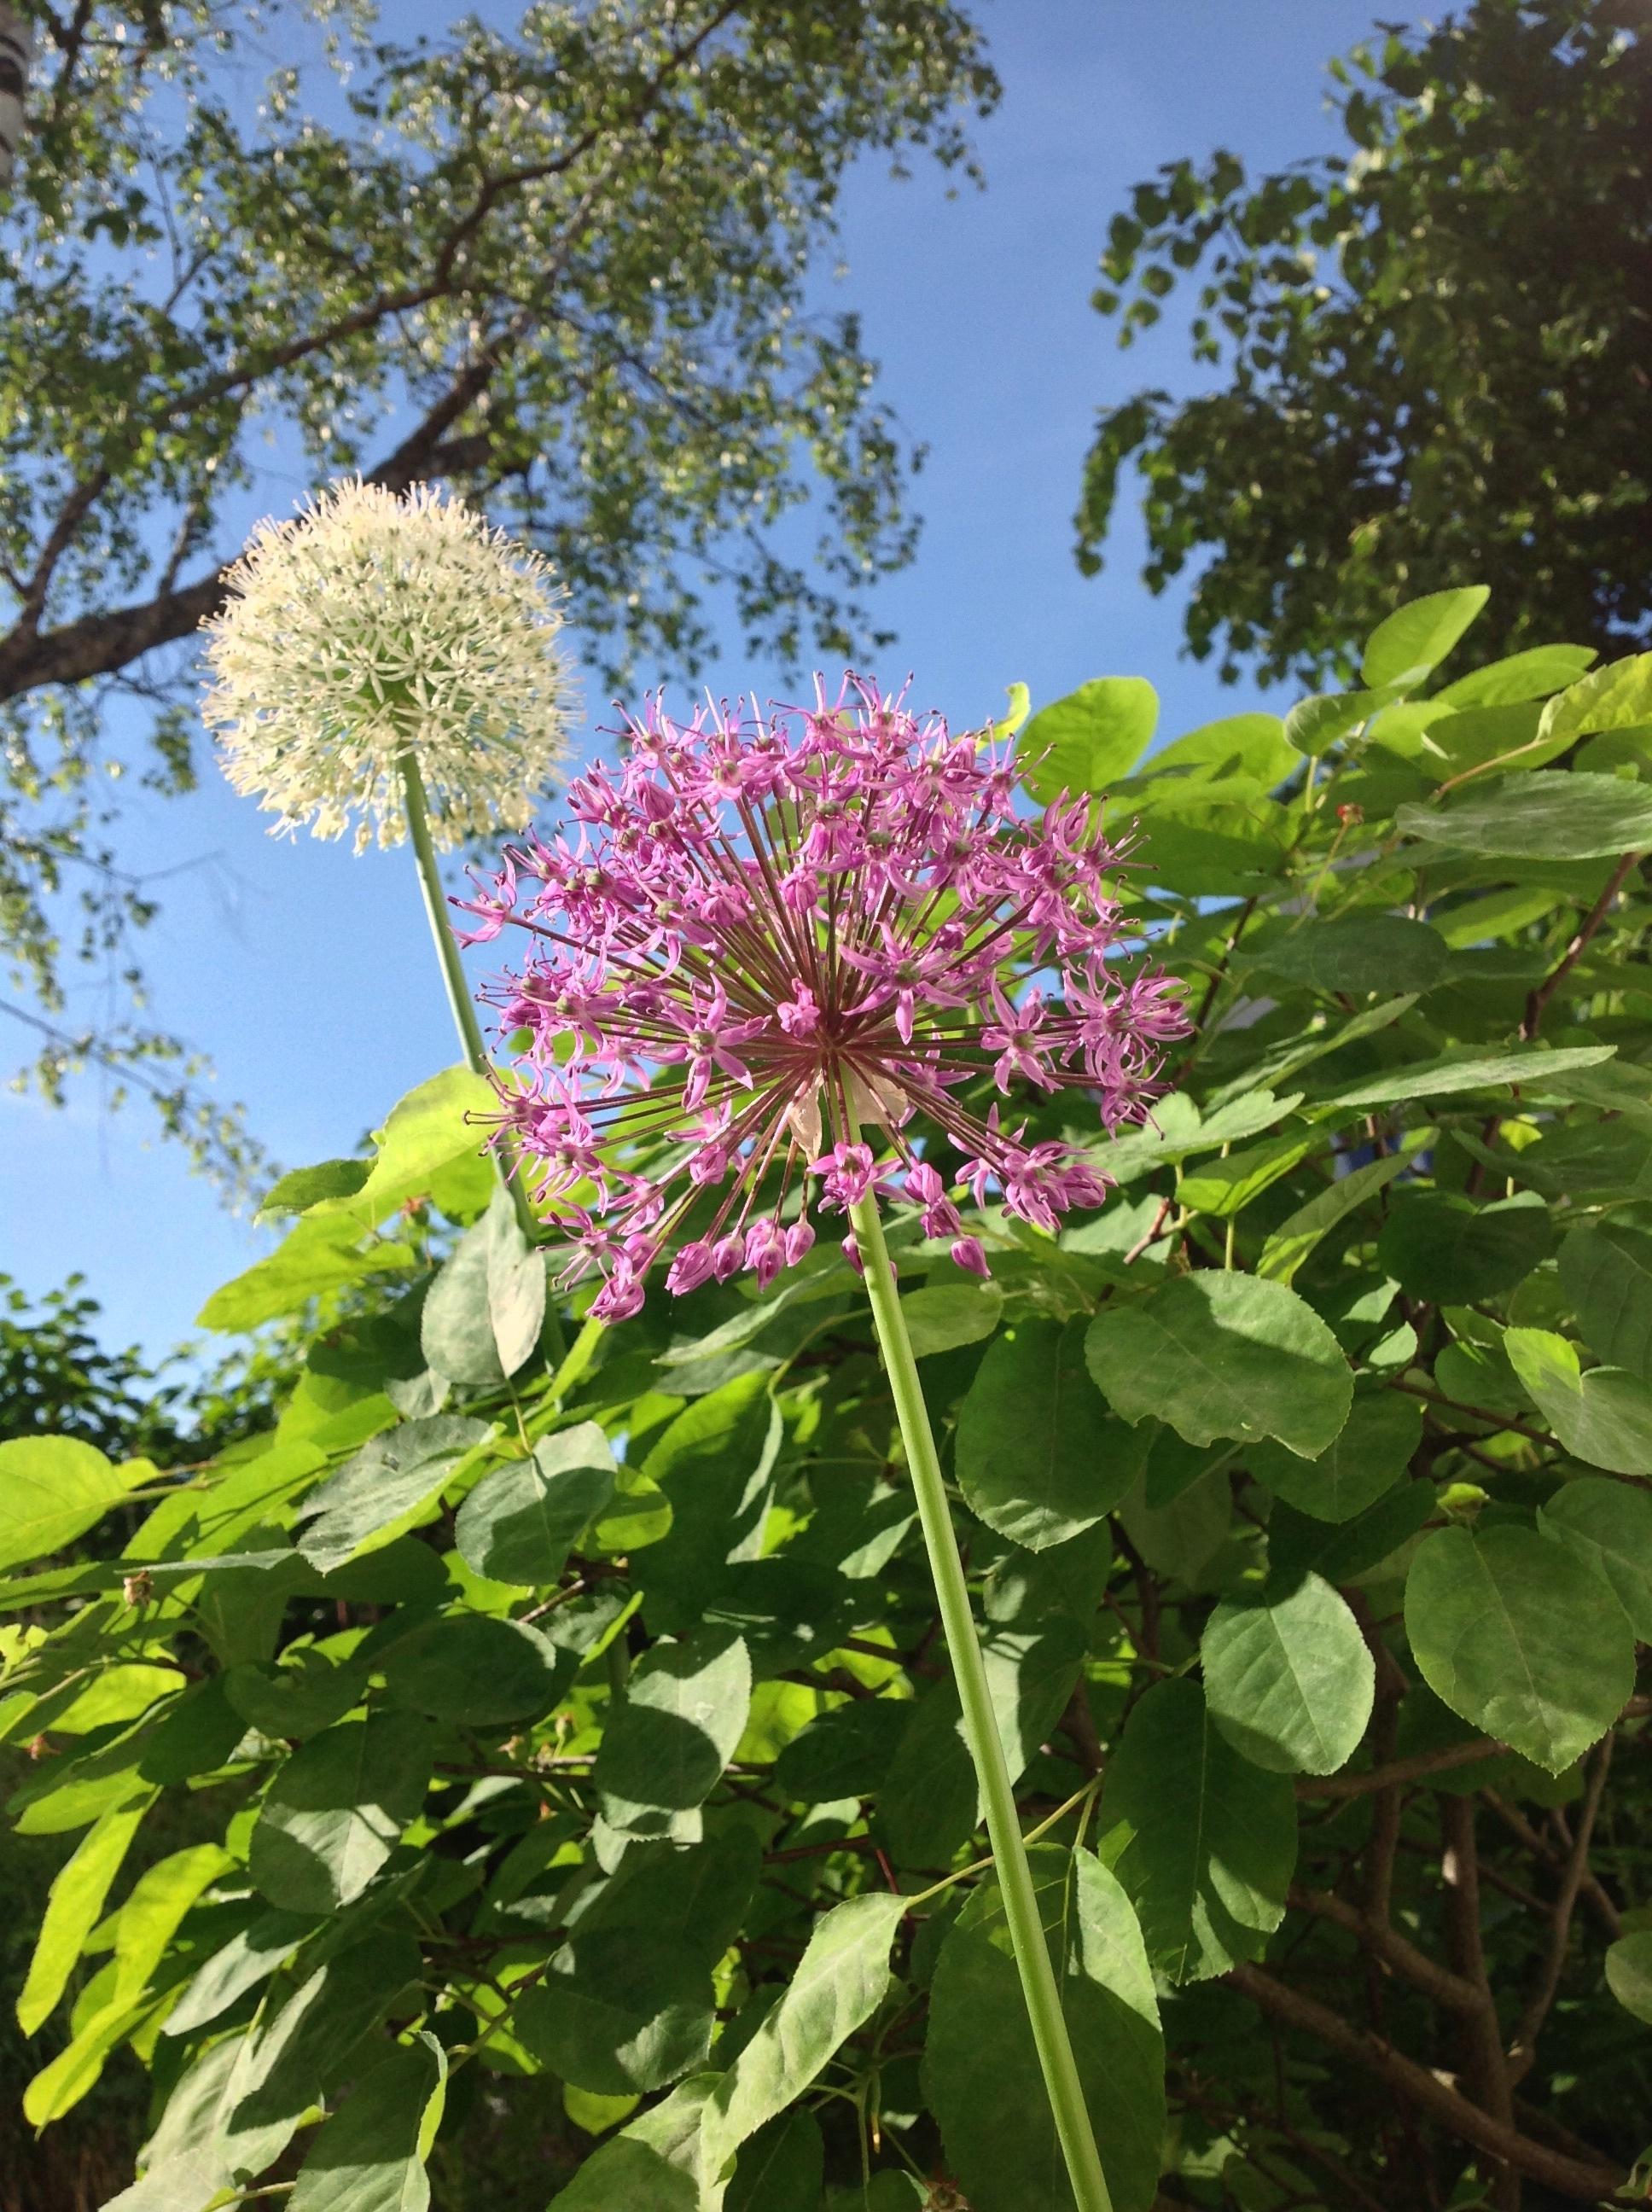 Free Images Tree Nature Sky White Flower Bush Green Botany